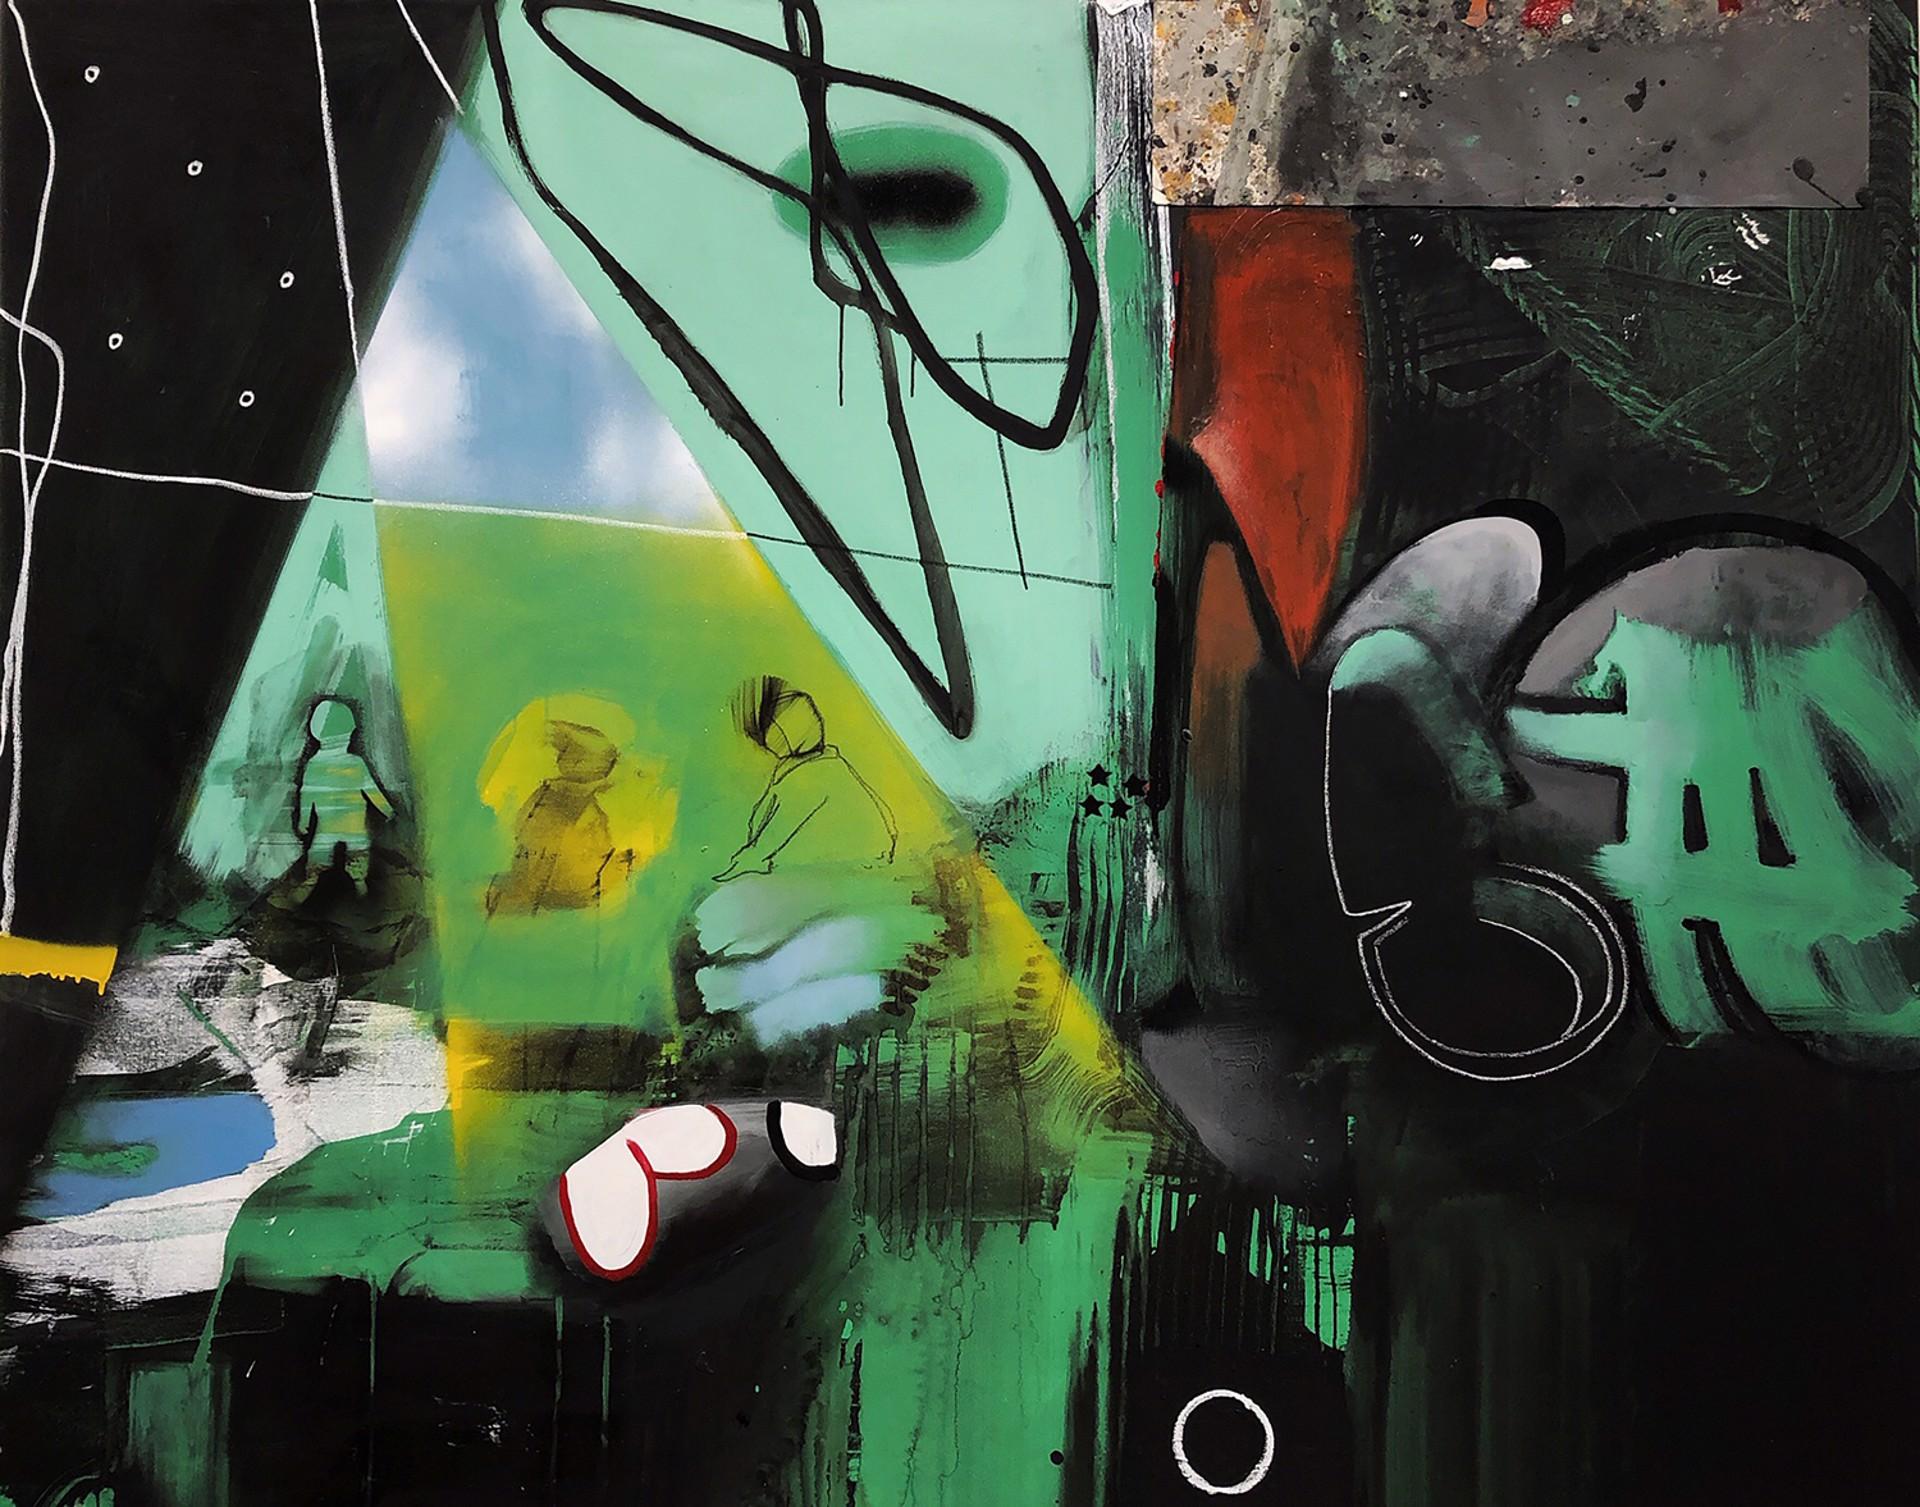 Tent City #7 by Marcus Jansen (b. 1968)